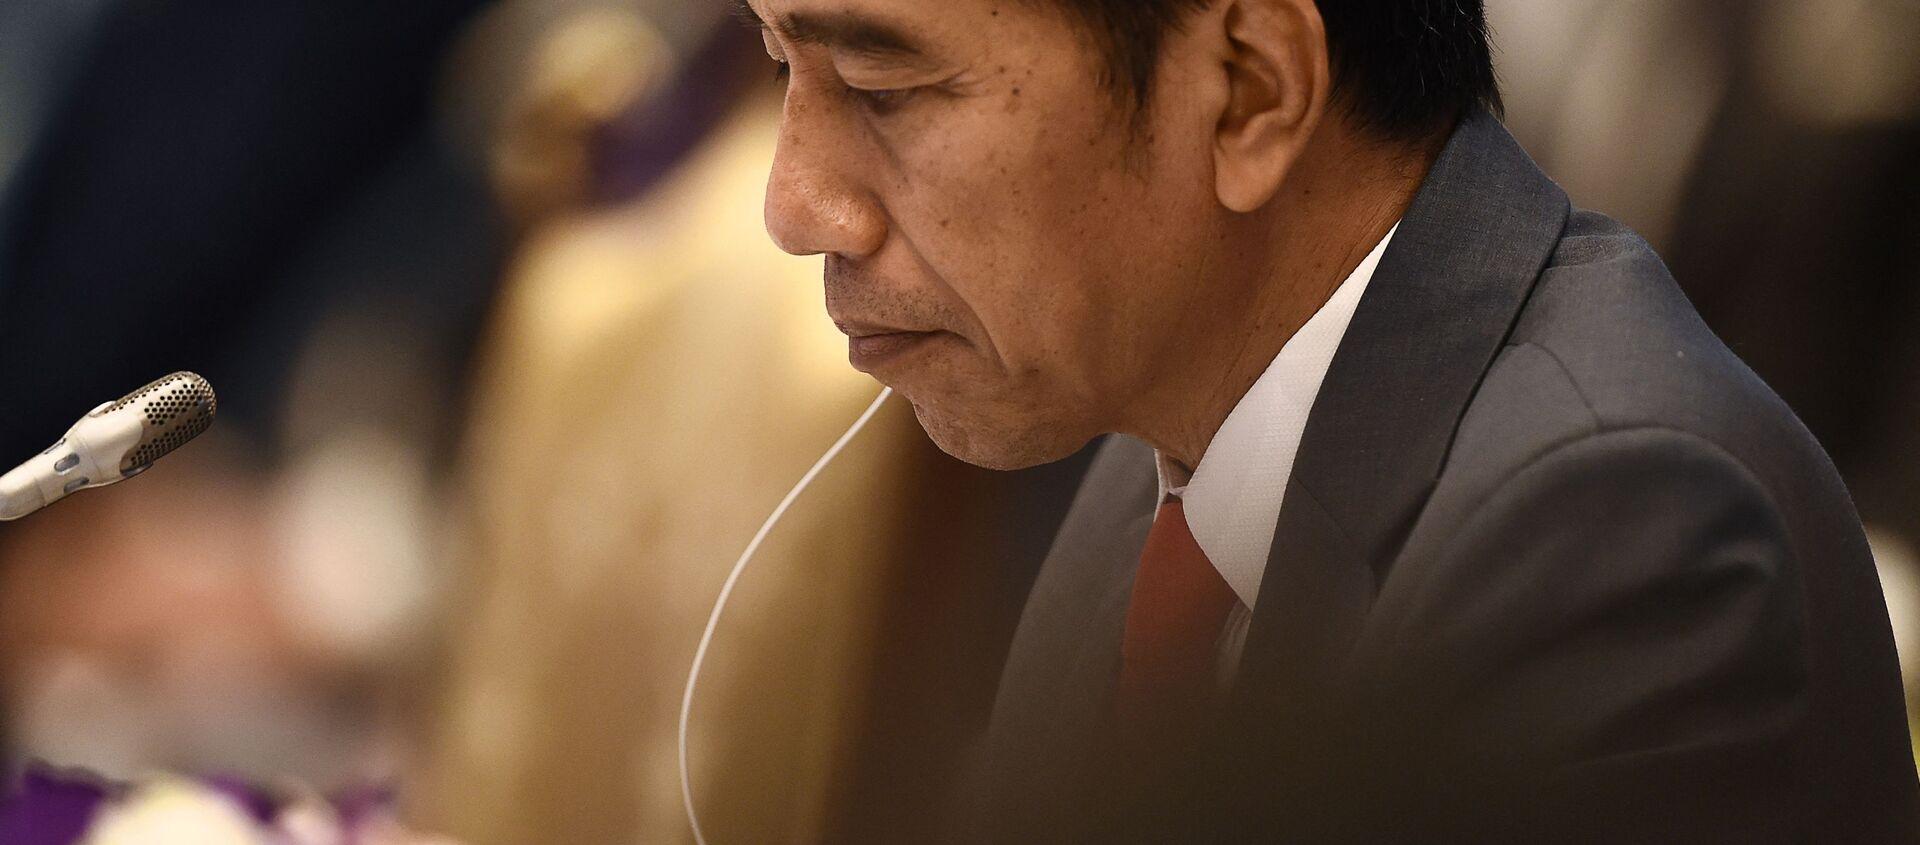 Tổng thống Indonesia Joko Widodo. - Sputnik Việt Nam, 1920, 28.04.2021